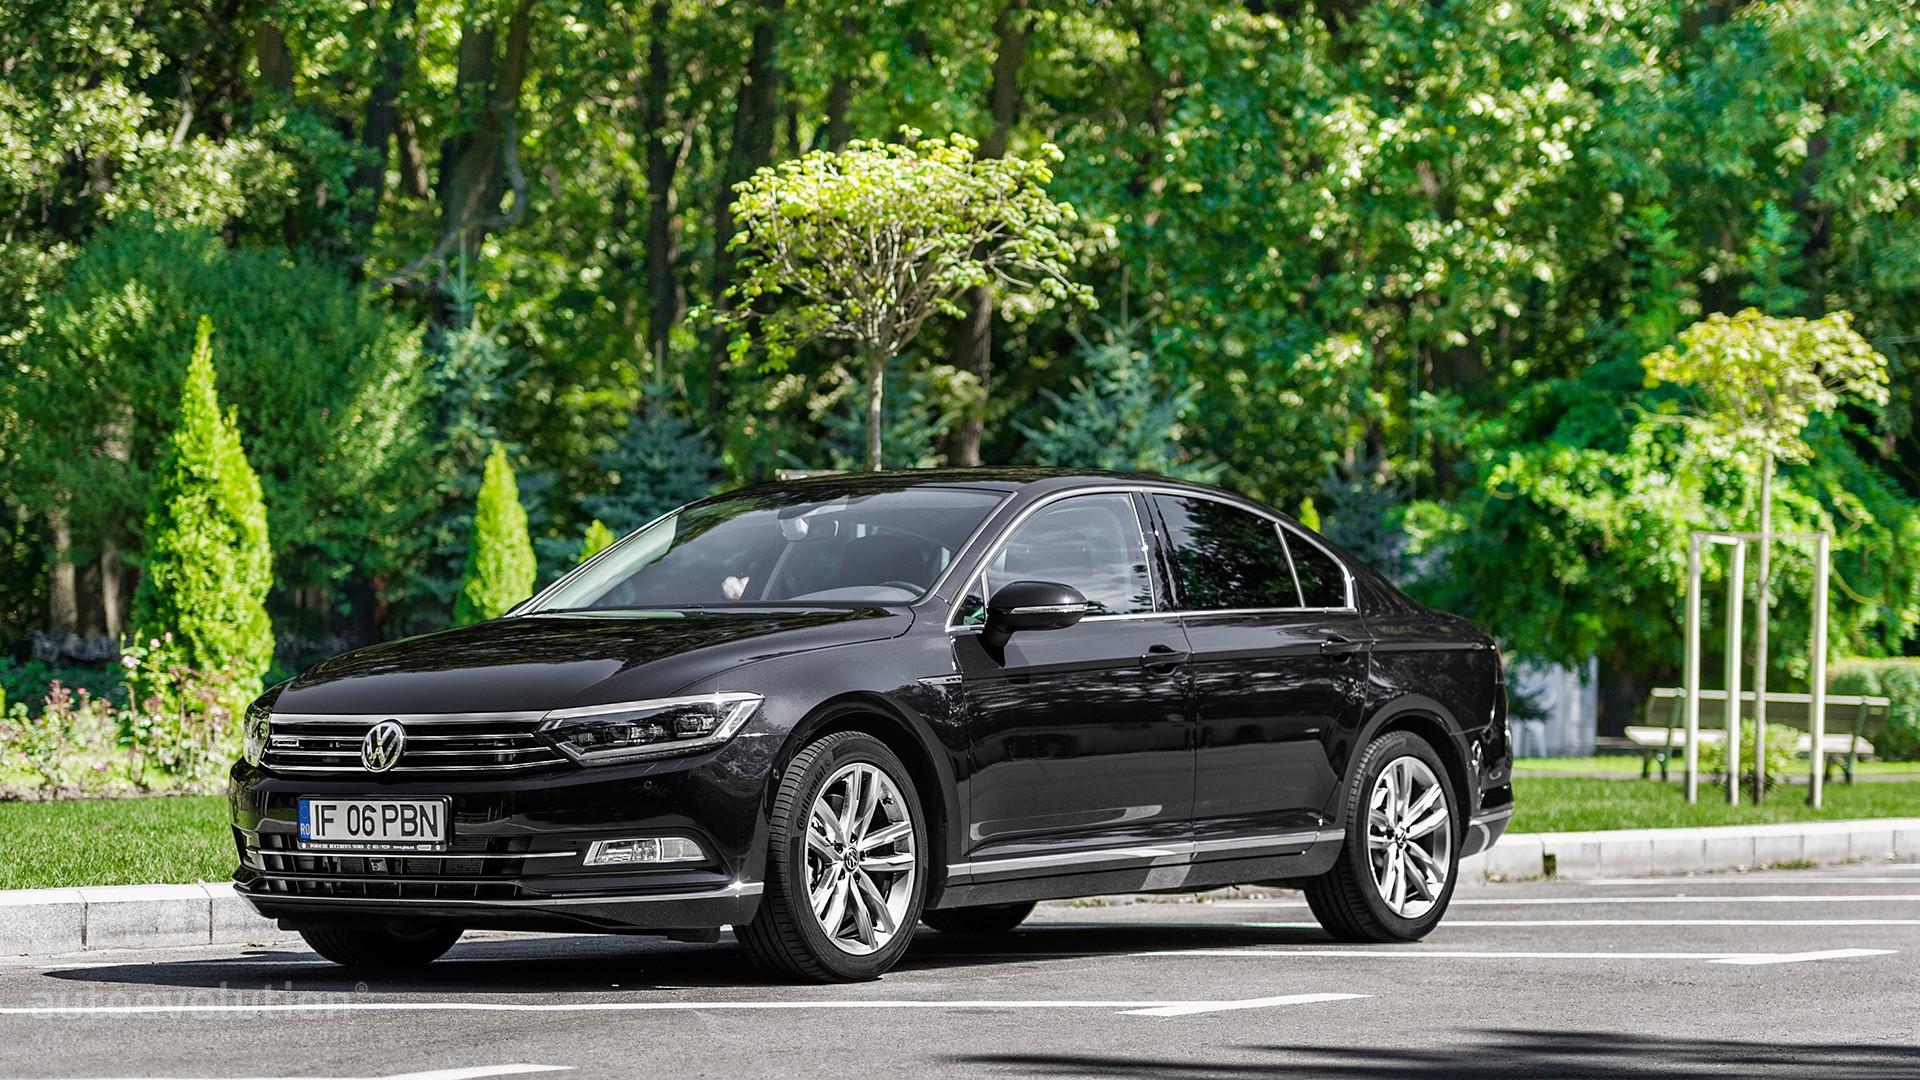 Volkswagen Confirms Passat Facelift and T-Cross Debuts for 2018 - autoevolution